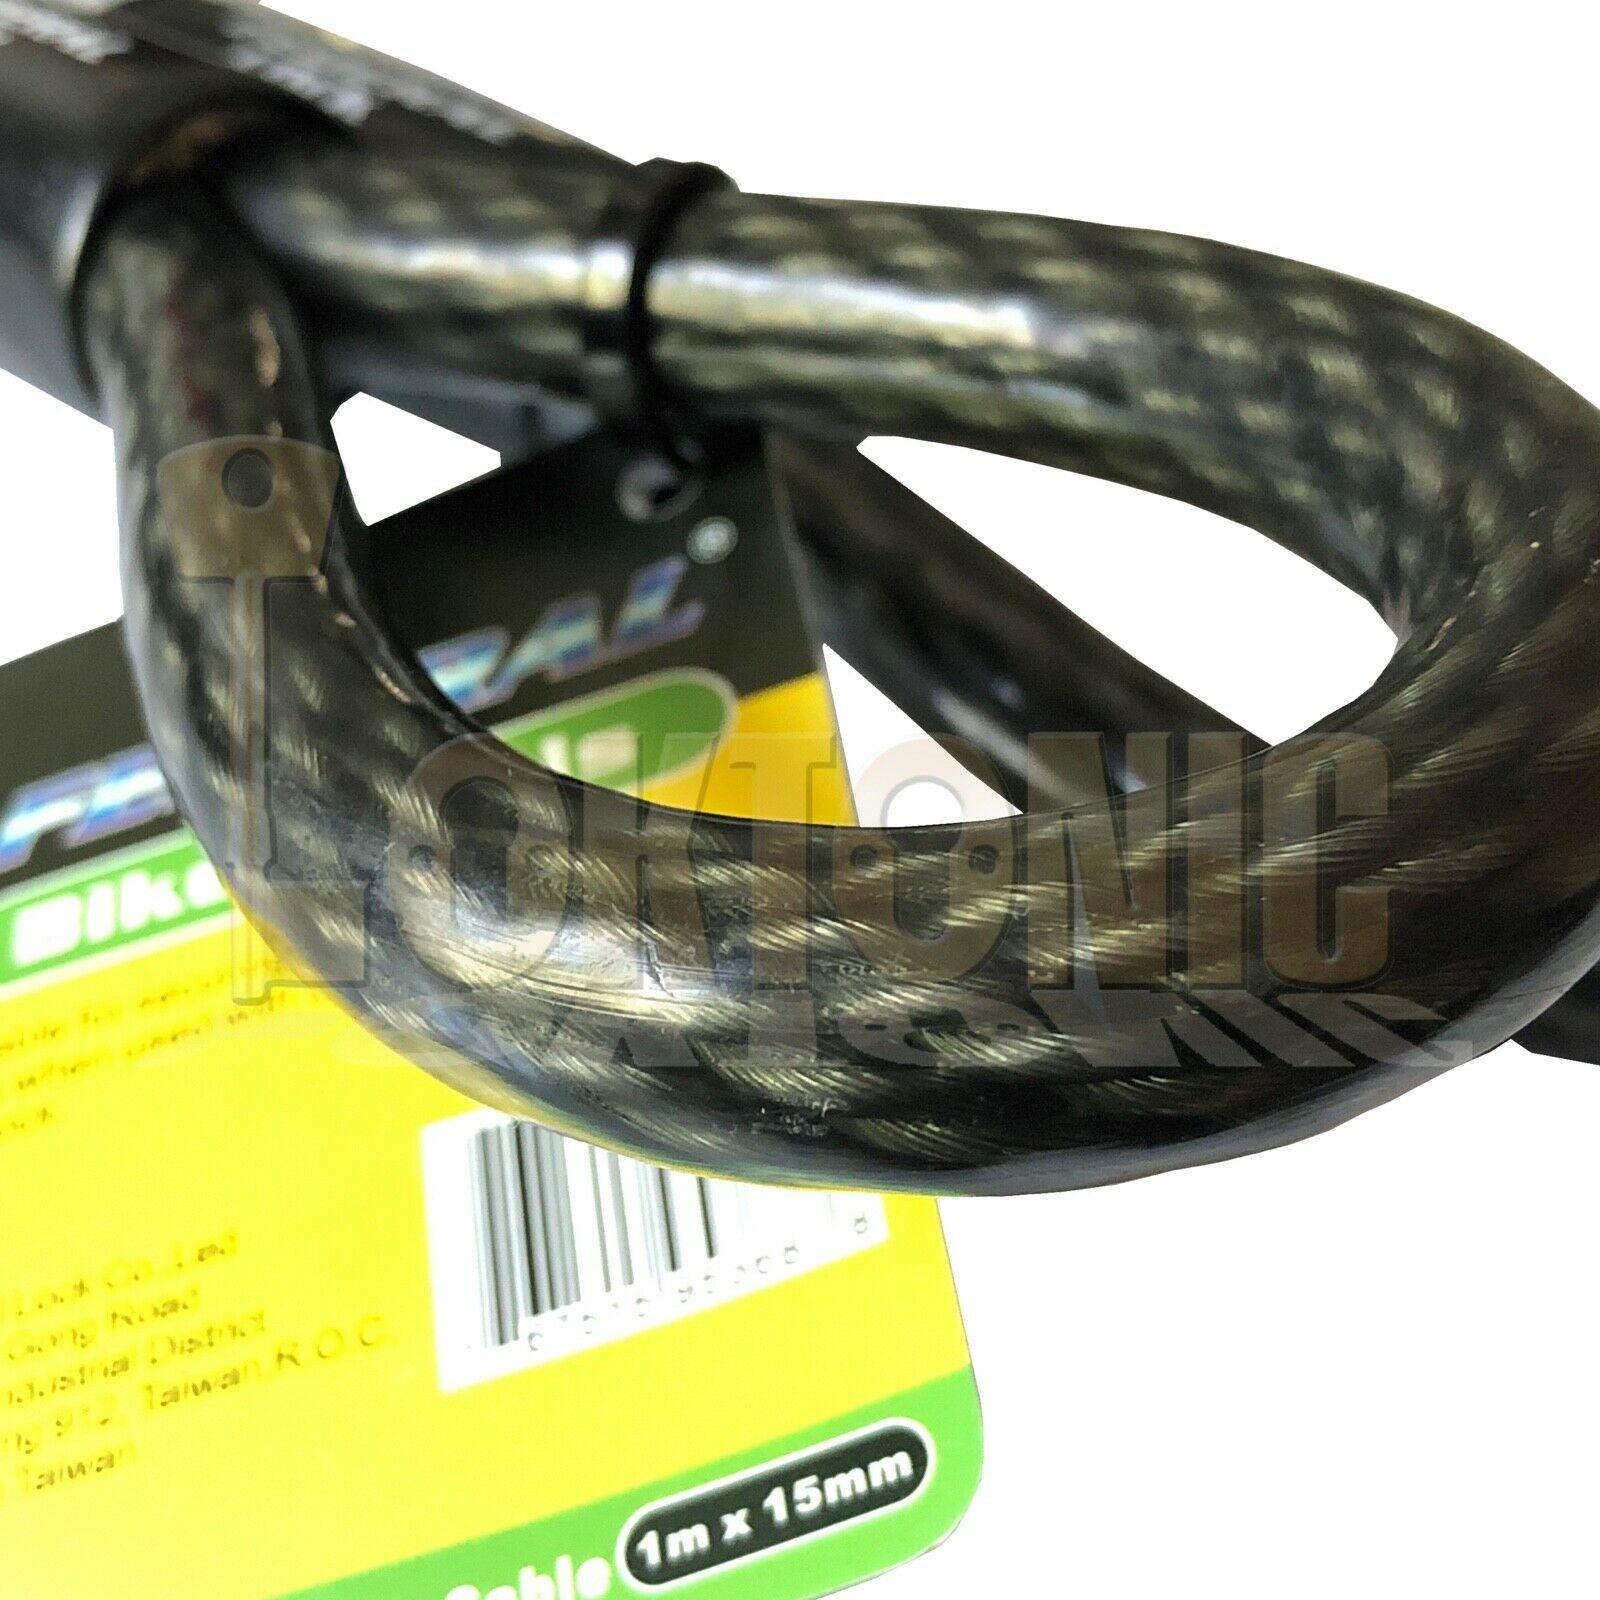 Federal 1.5m 15mm Motorcycle Quad Bike Heavy Duty Security Steel Loop Cable